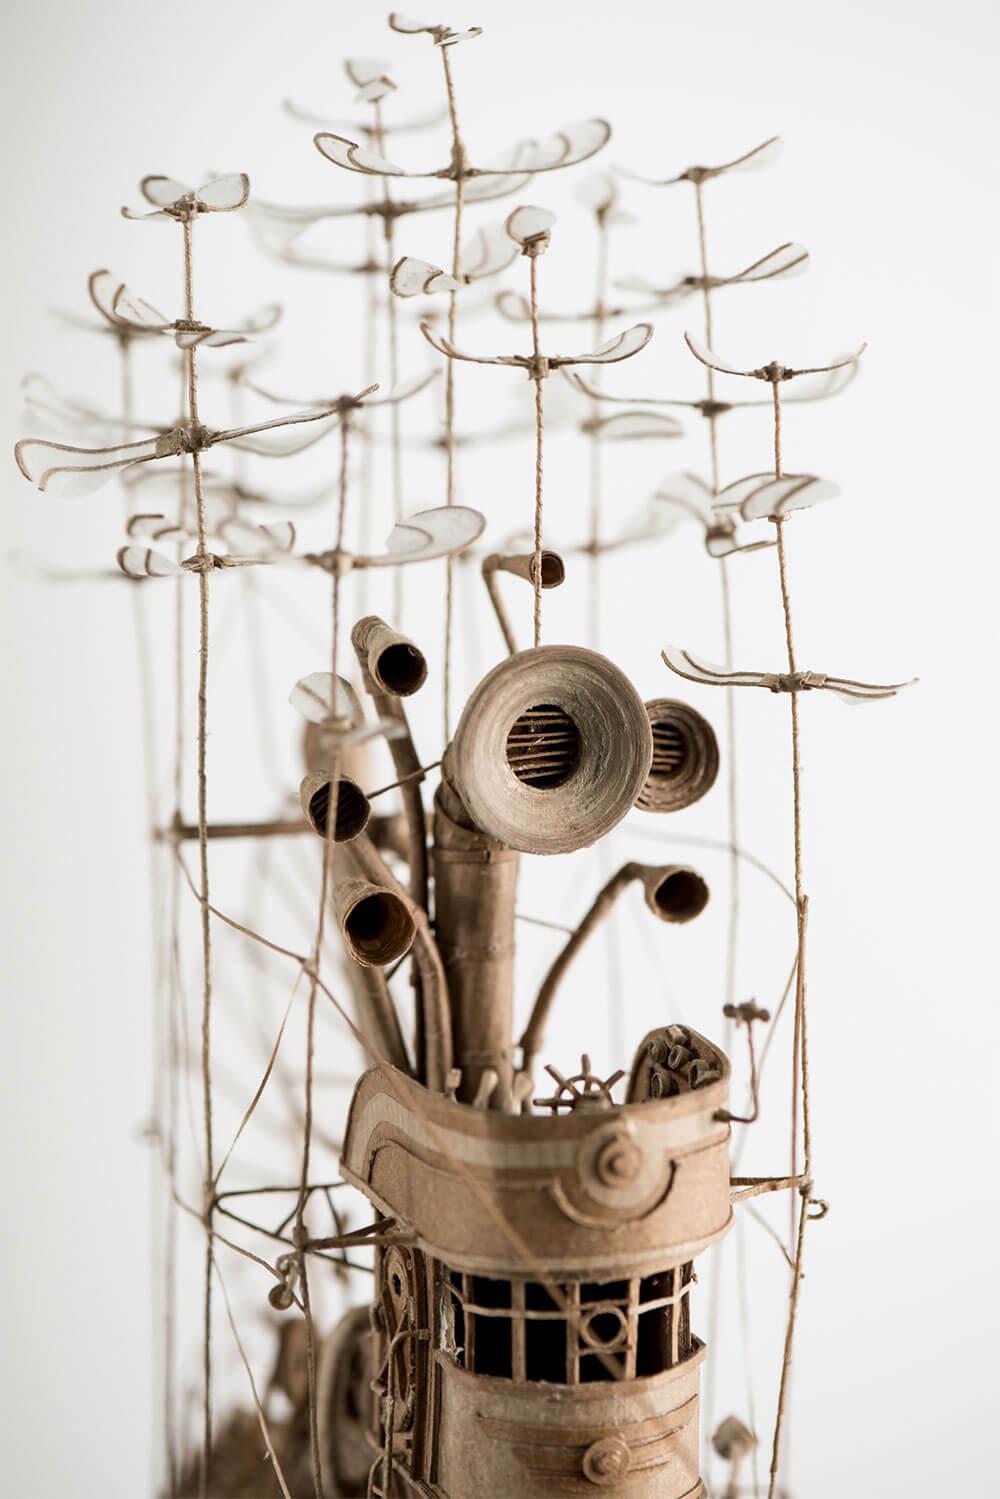 sculptural airships cardboard 2